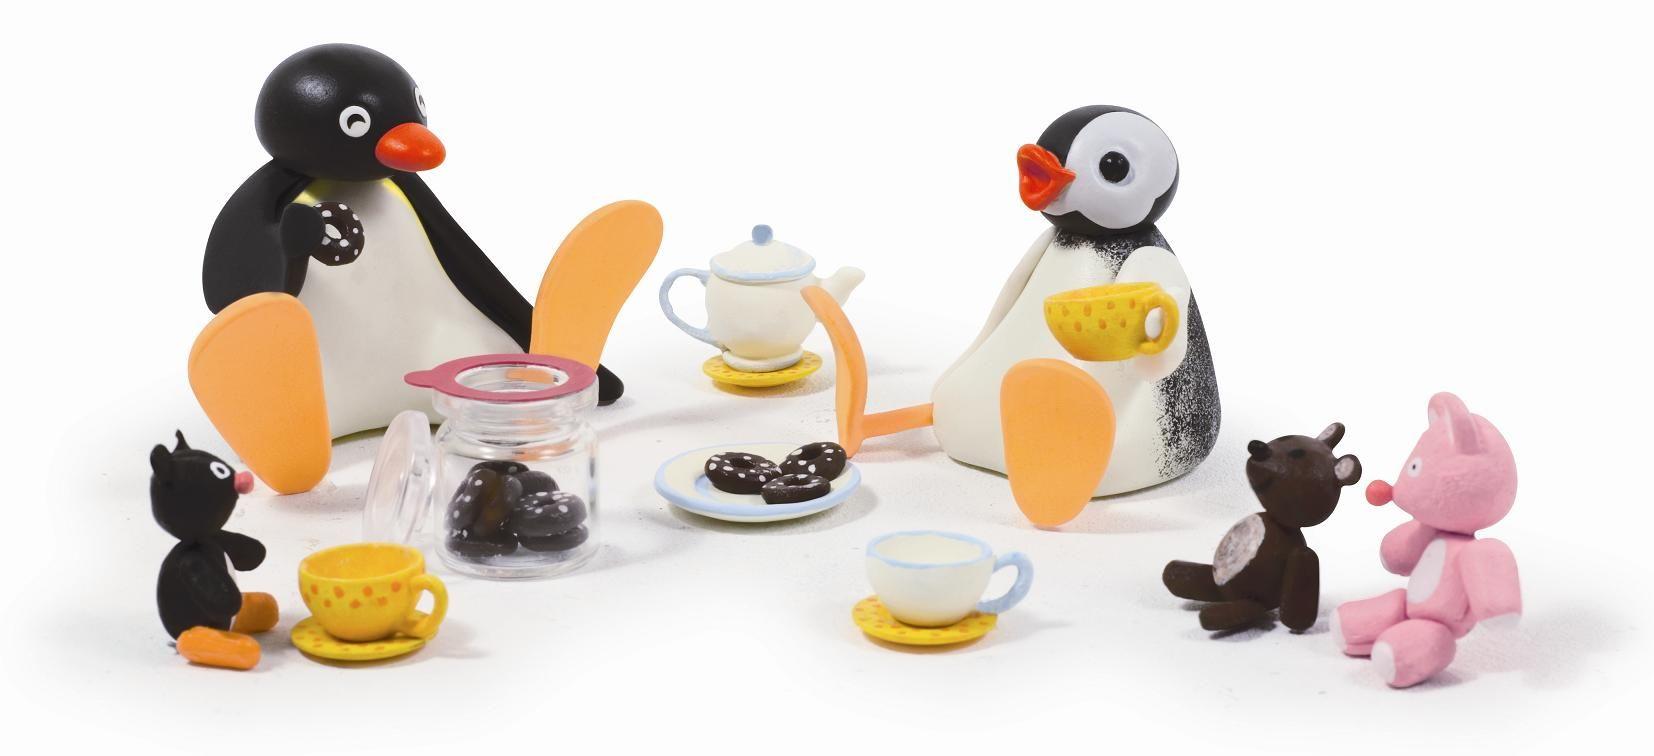 Pingu and Pinga at a tea party | Pingu | Pinterest